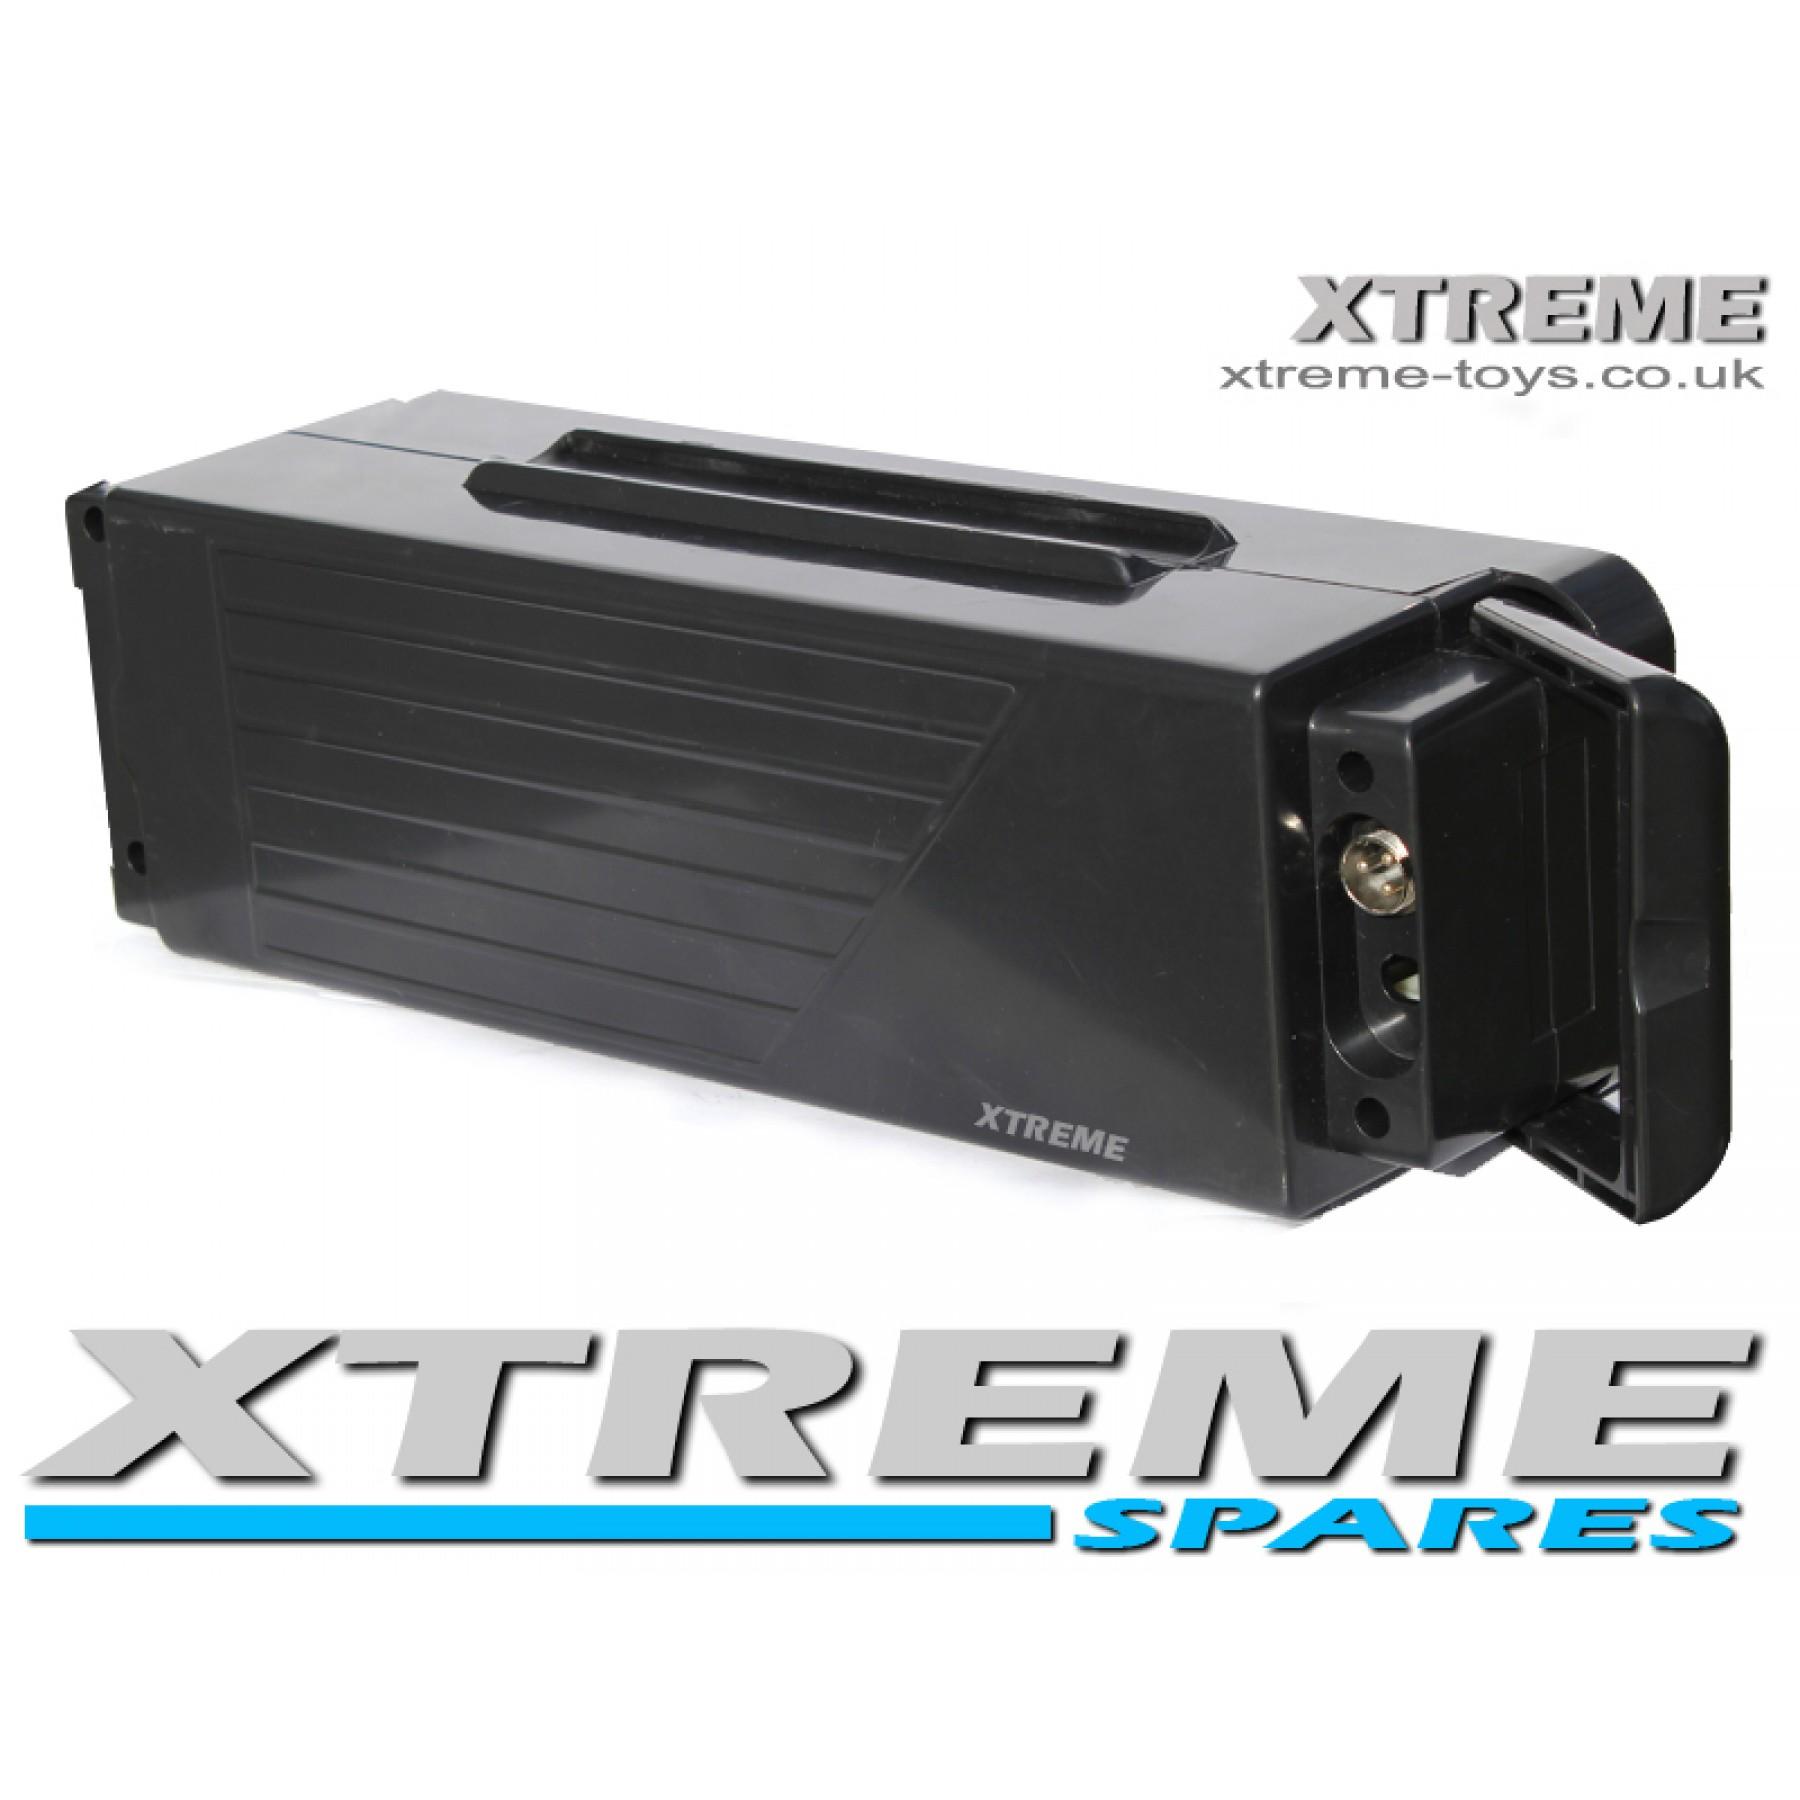 XTREME ELECTRIC 24v 500w XTM DIRT BIKE/ MOTOR BIKE/ SCOOTER/ QUAD BATTERY